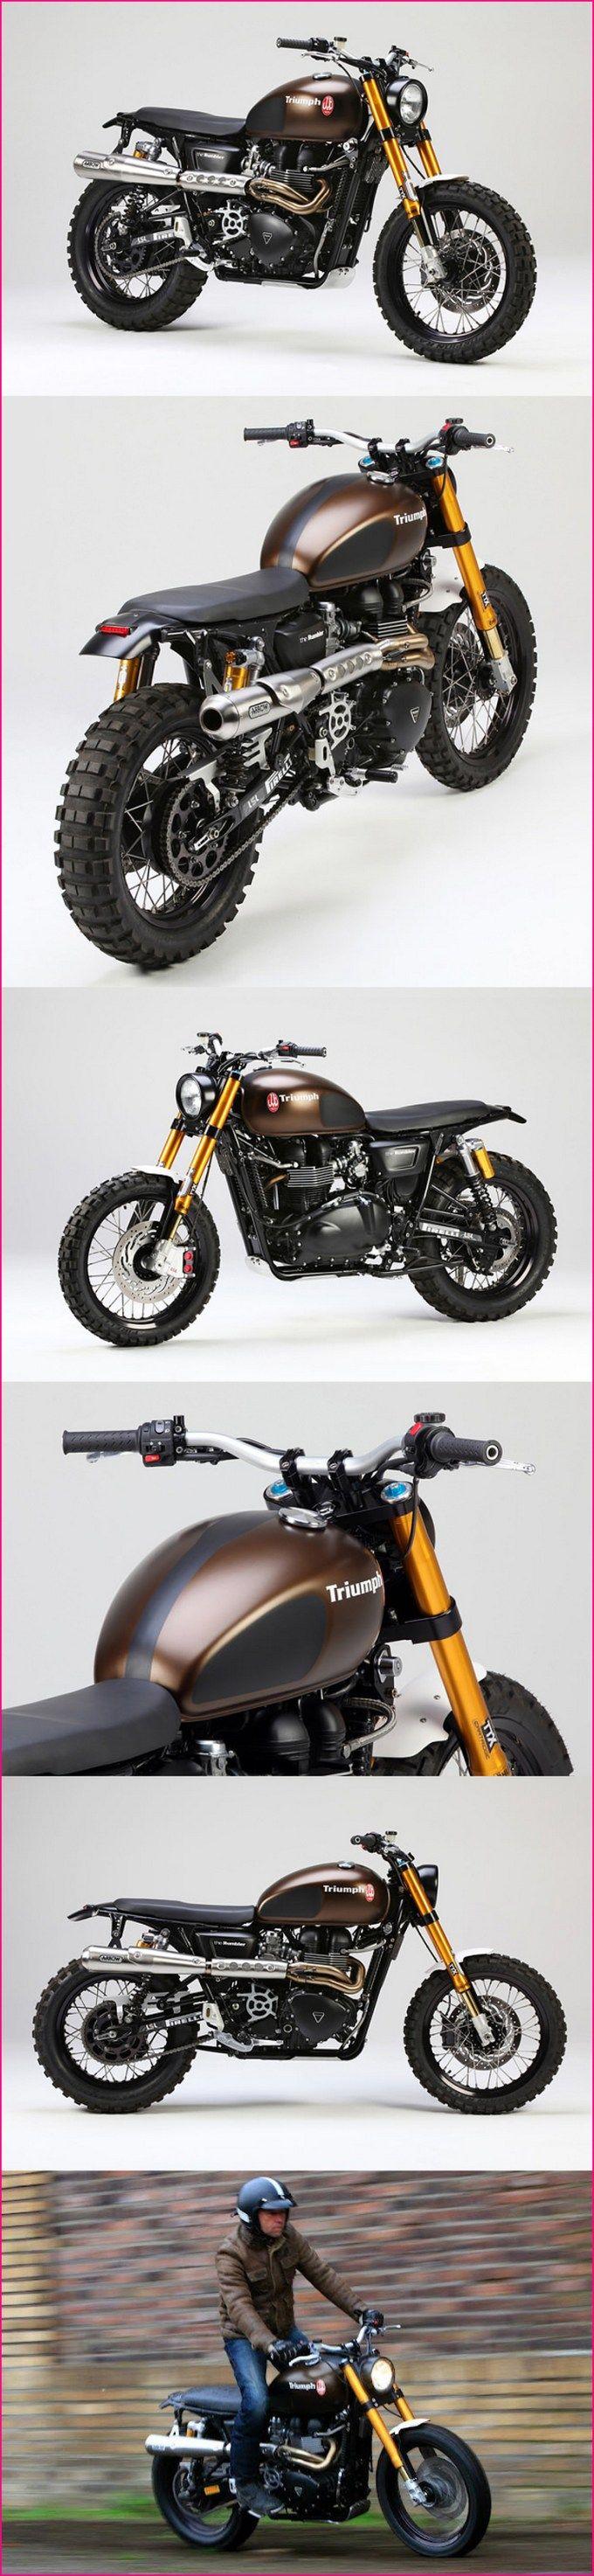 39 best cars motos images on Pinterest